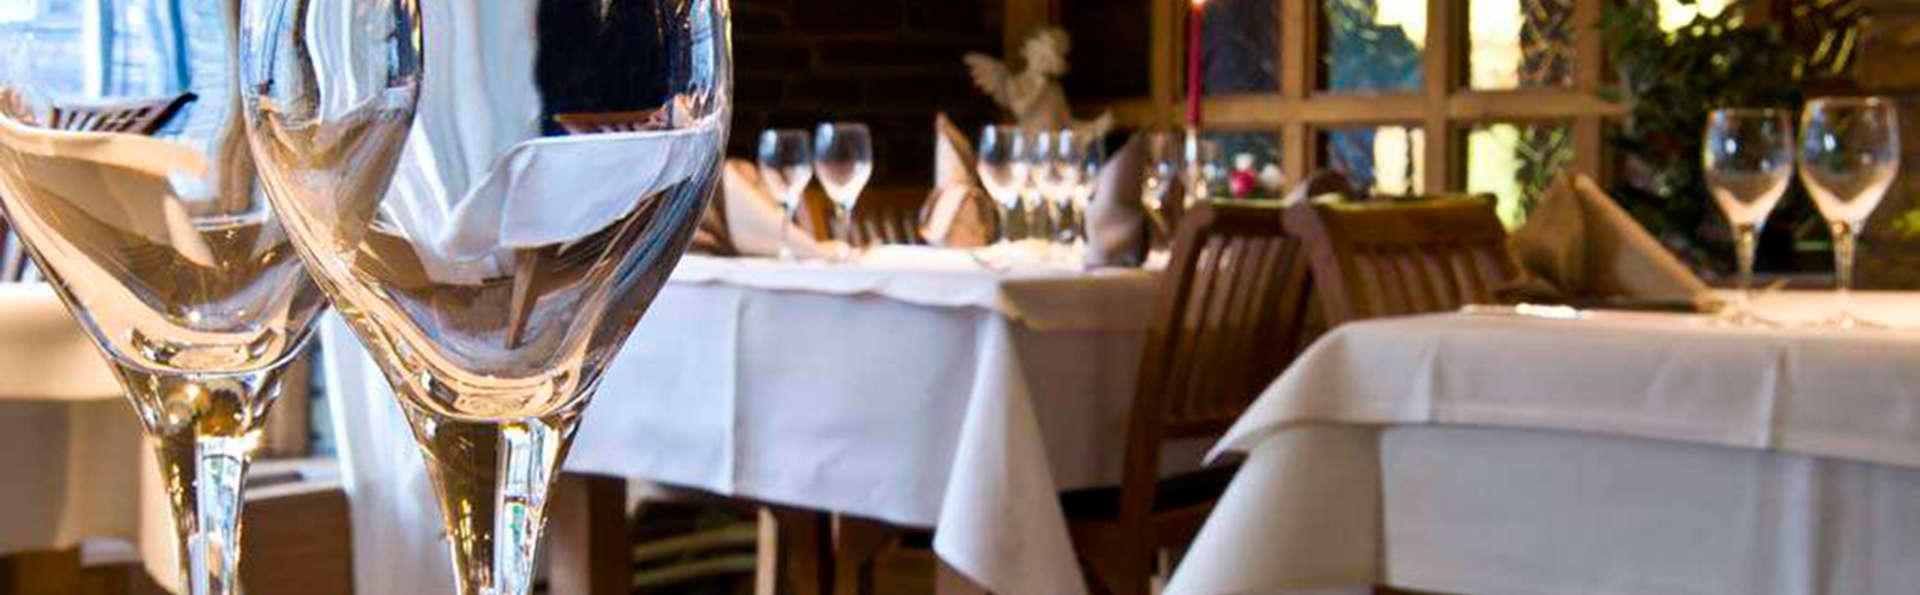 Cocoon Hôtel du Commerce - edit_restaurant_detail.jpg